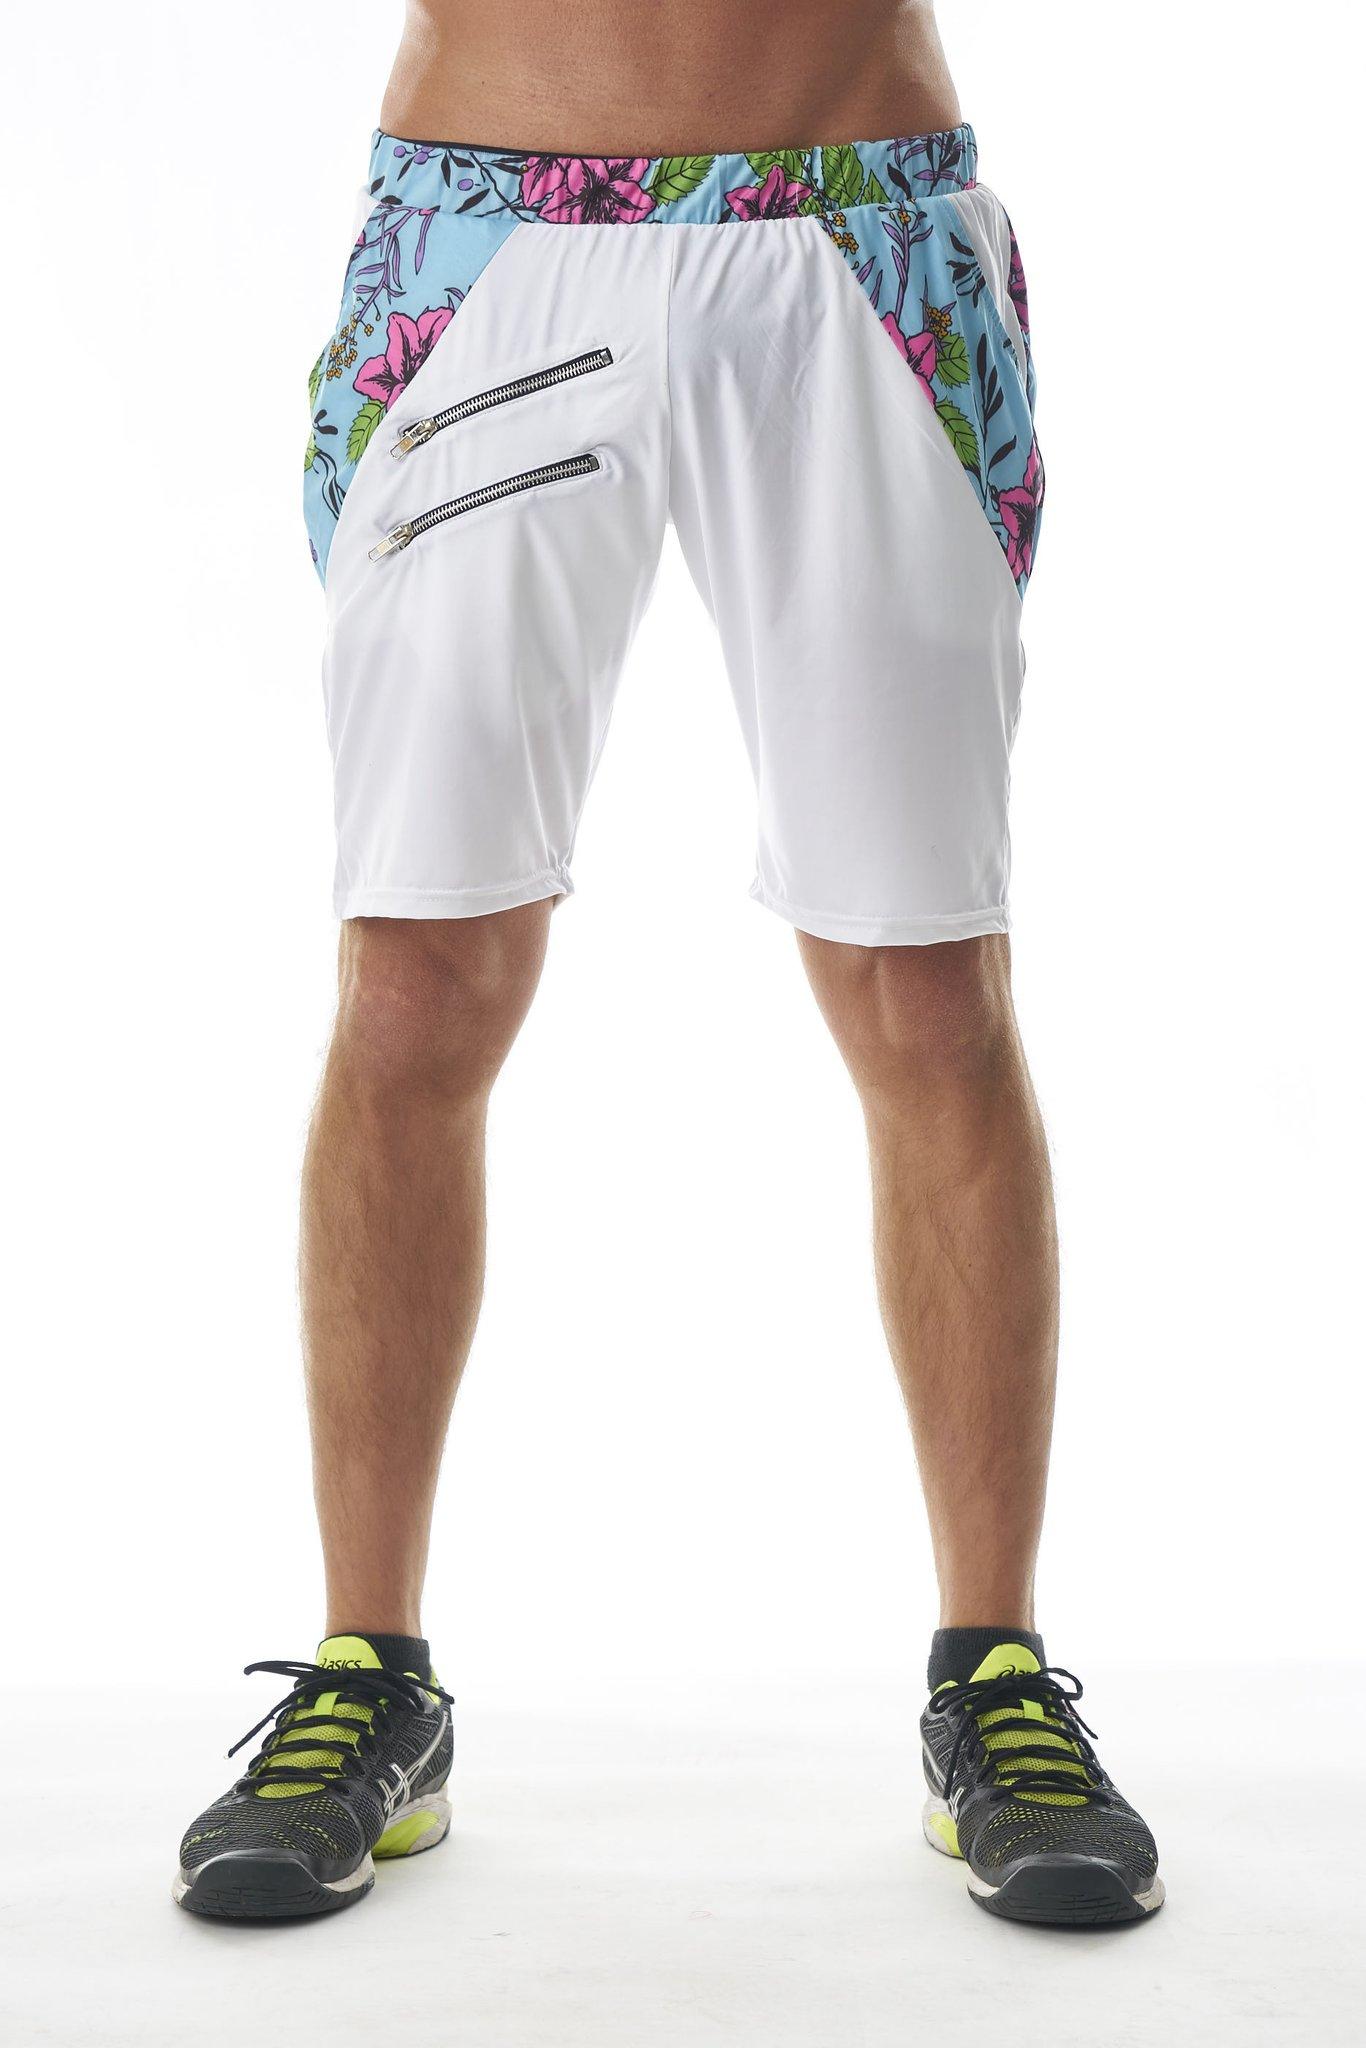 Party Rock Clothing★パーティーロッククロッシング ★La Freak Athletic Shorts